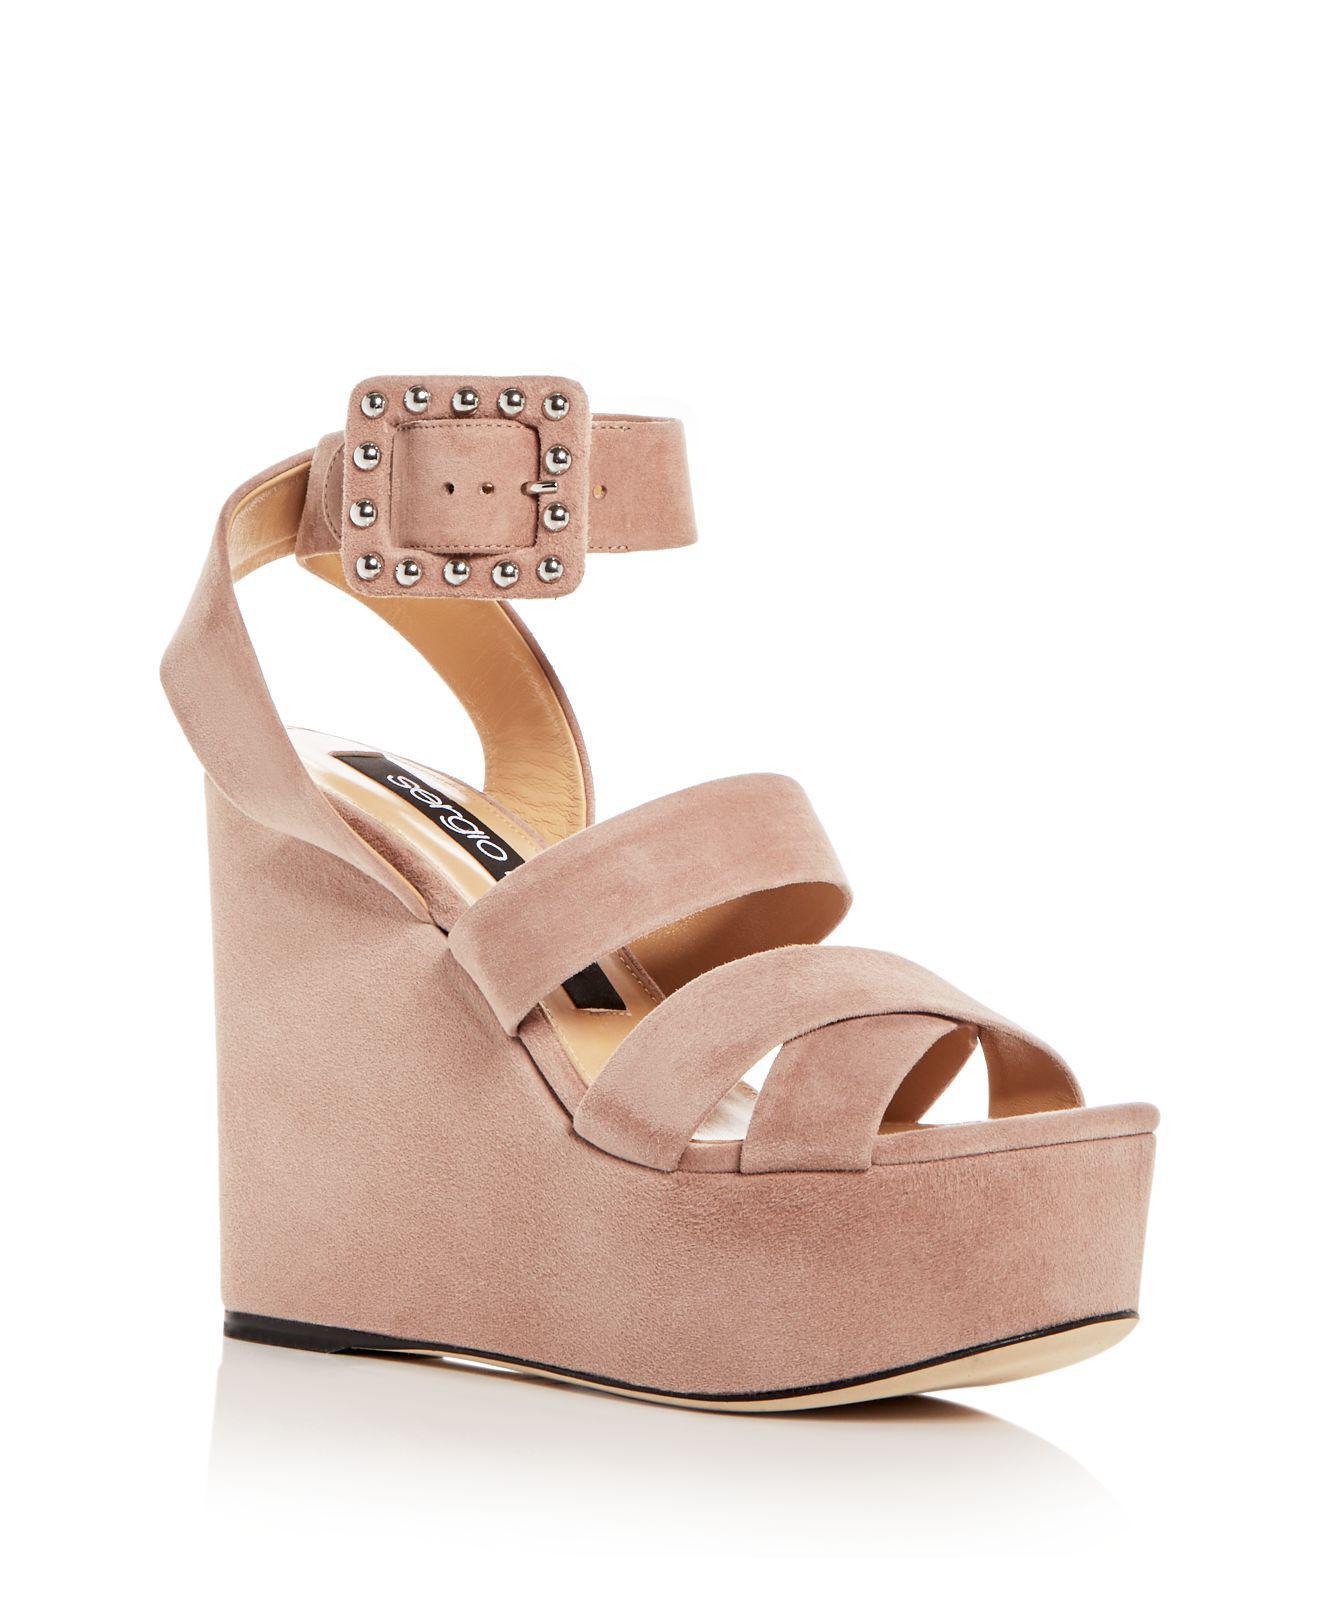 Sergio Rossi Women's Elettra Suede Ankle Strap Platform Wedge Sandals qJTf7MIb